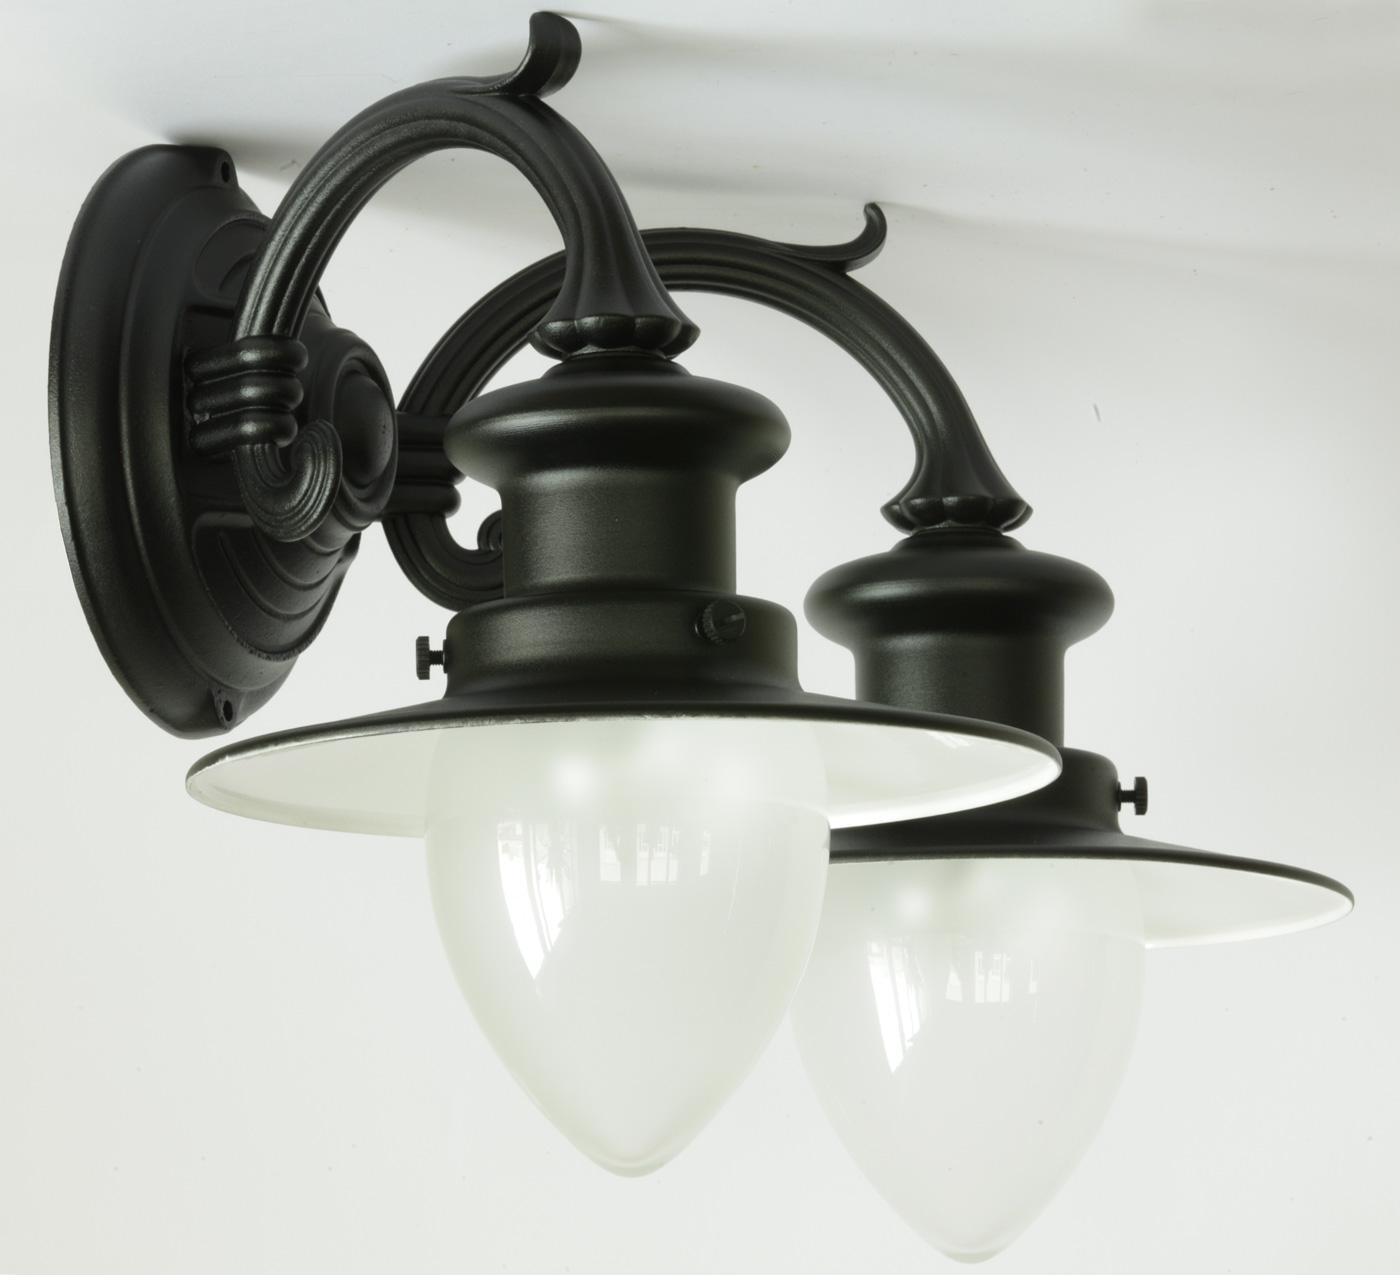 zweiflammige wandlampe f r au en mit spitzzylindern. Black Bedroom Furniture Sets. Home Design Ideas